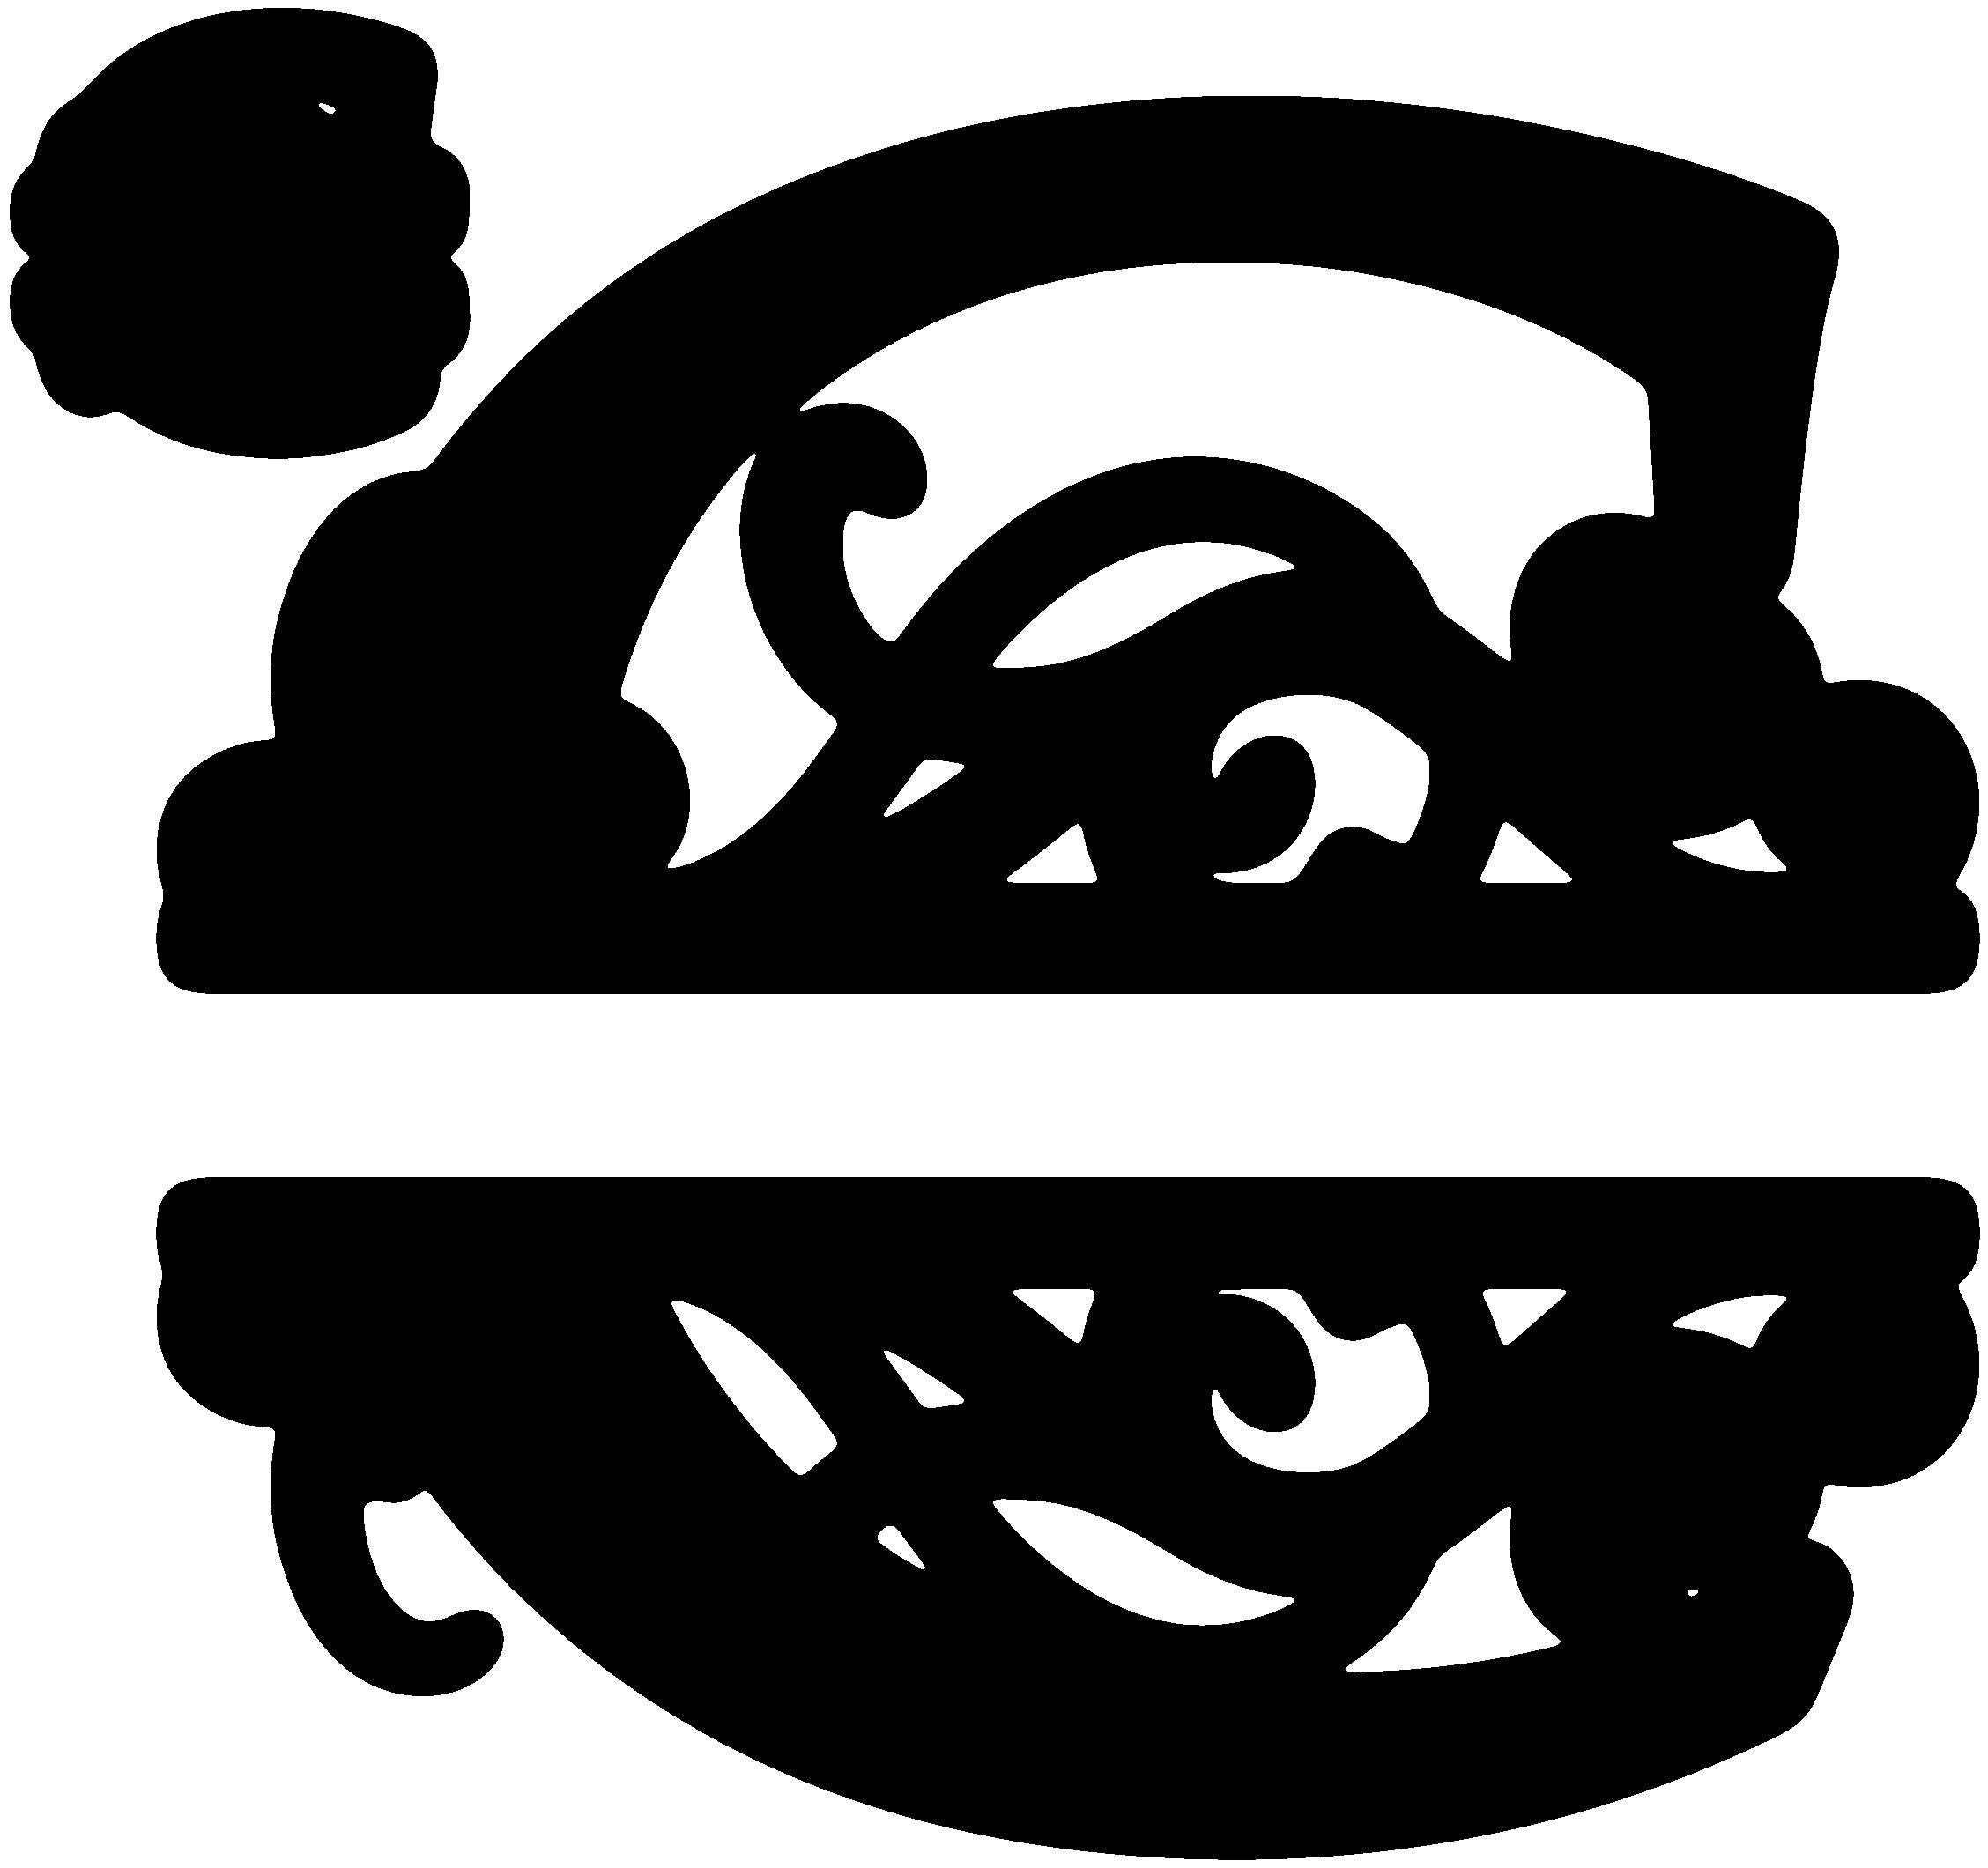 The Letter C Monogram Clipart.